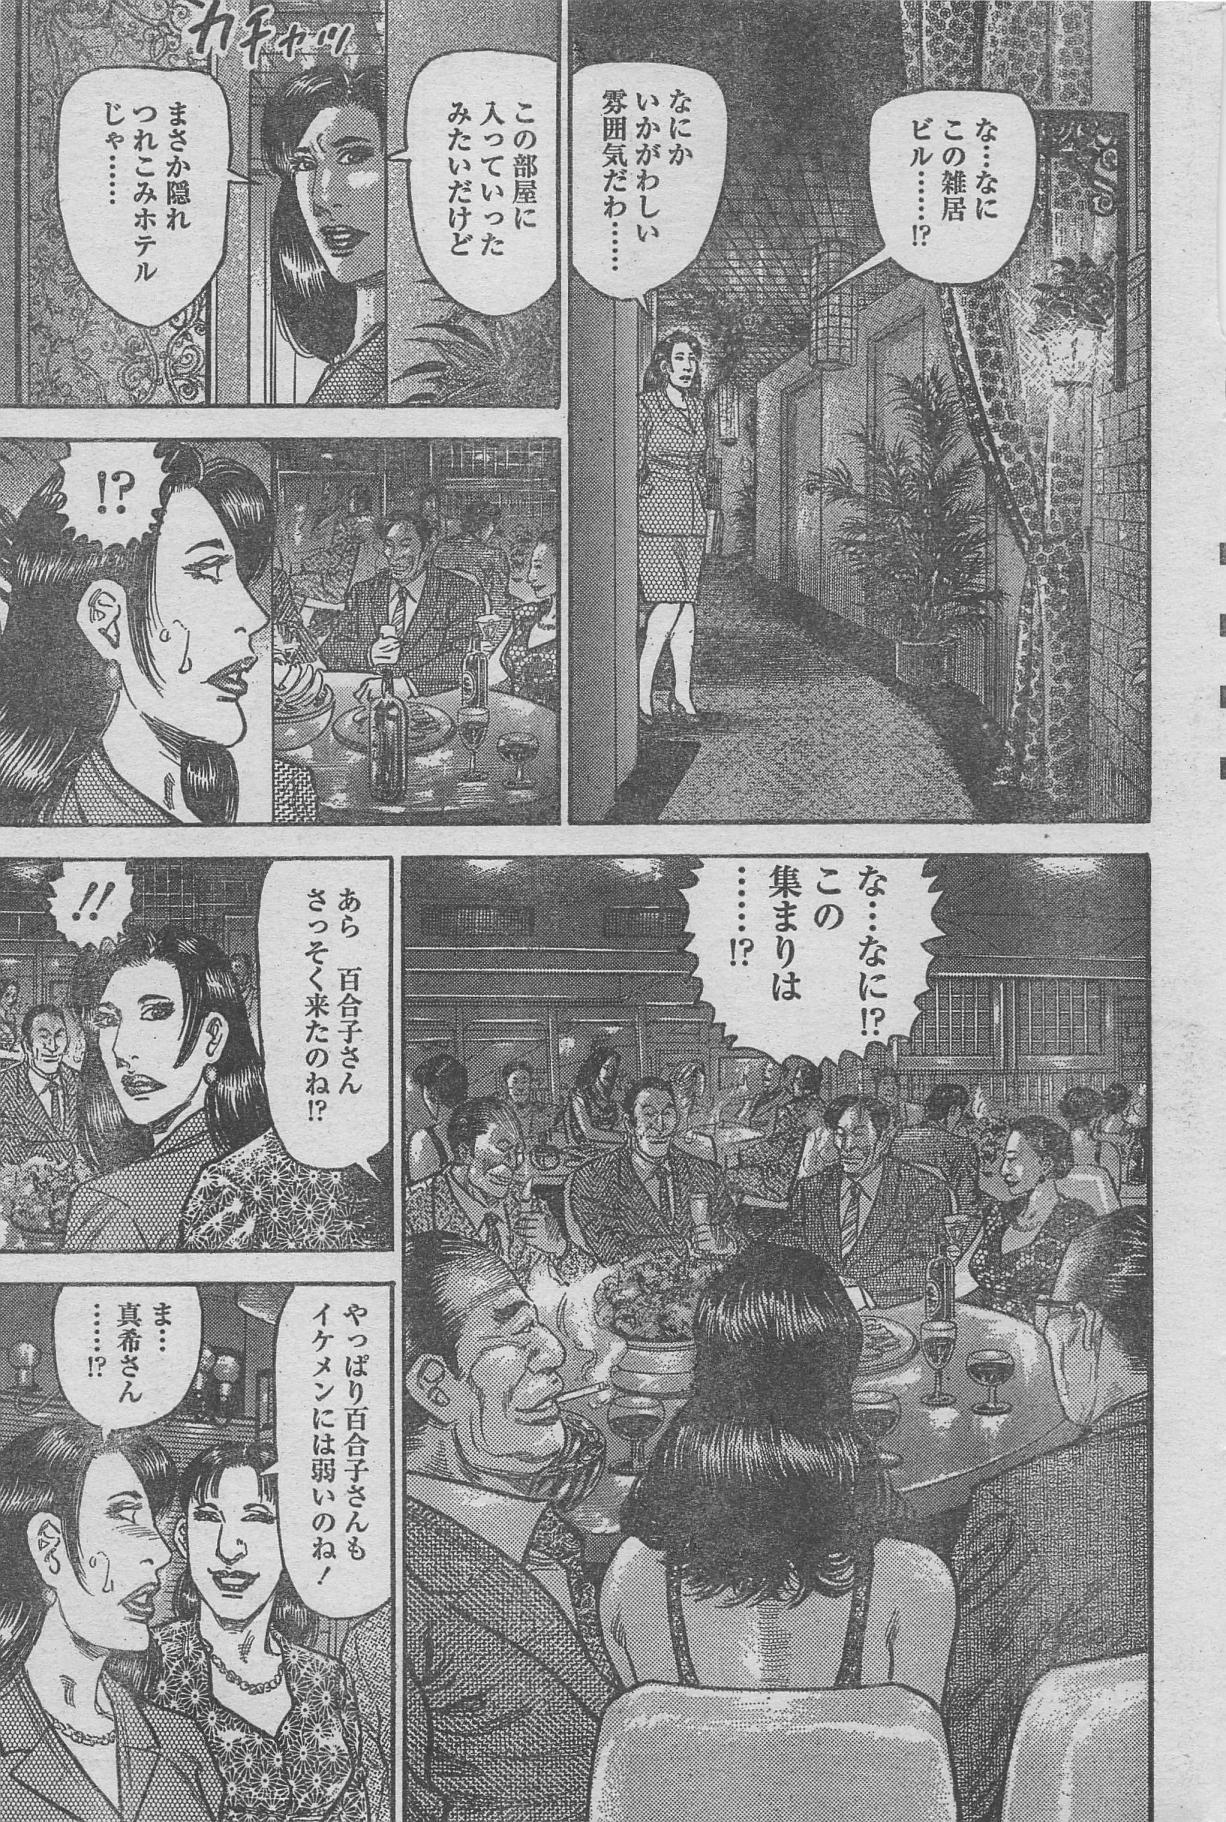 Manga Lawrence 2013-04 54